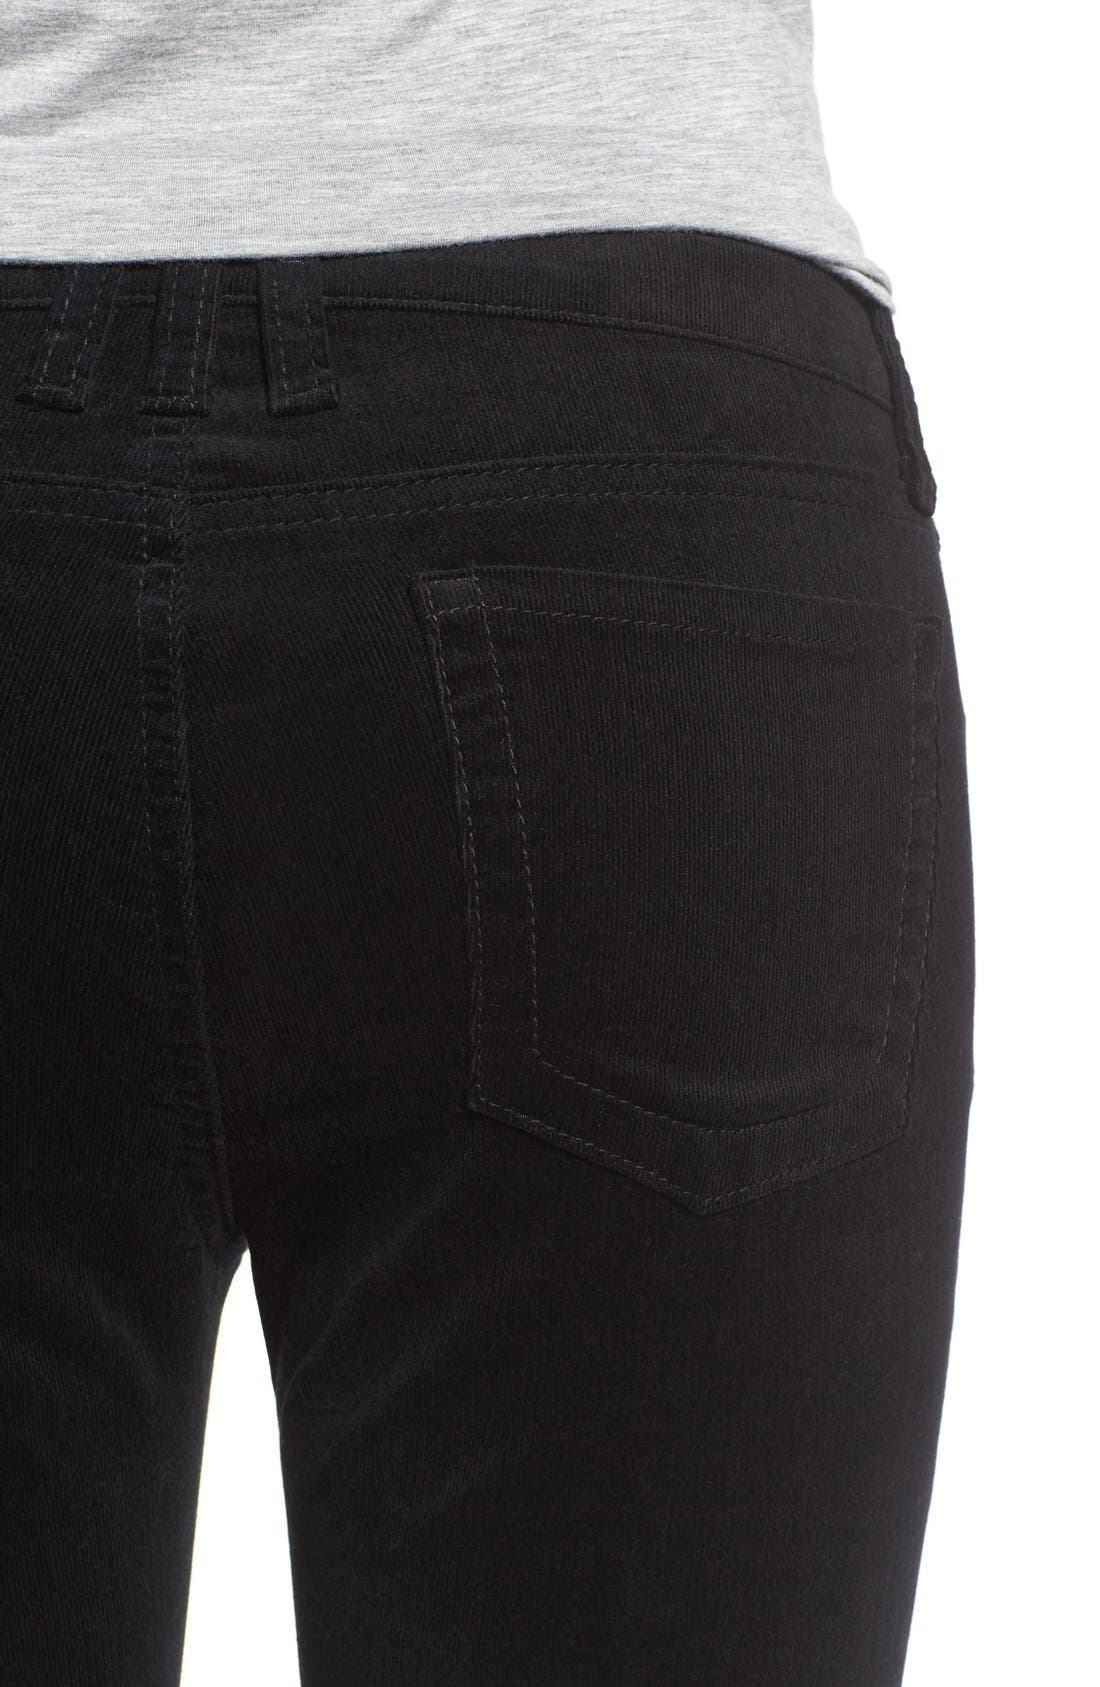 'Diana' Stretch Corduroy Skinny Pants,                             Alternate thumbnail 223, color,